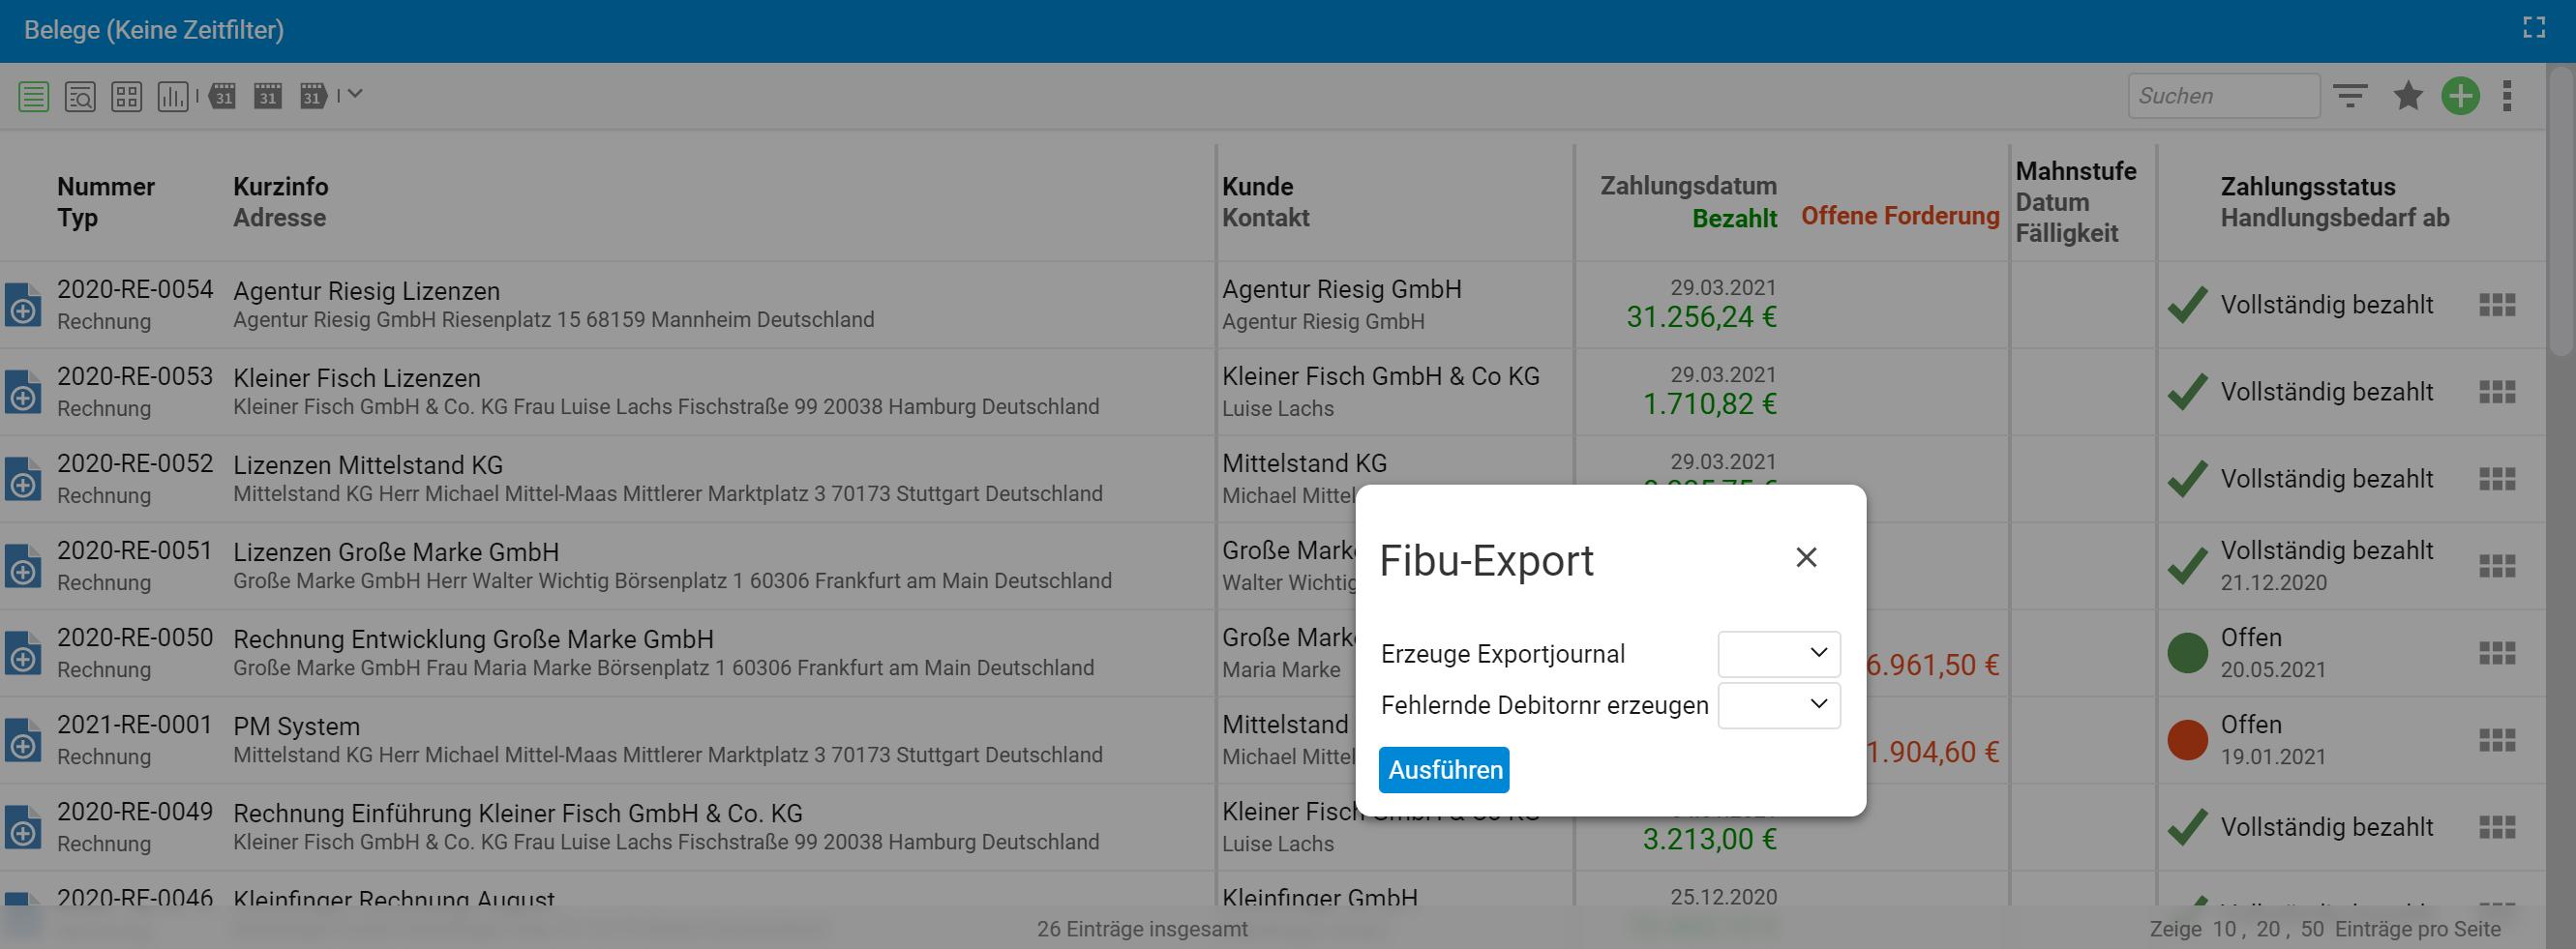 Fibu-Export in projectfacts